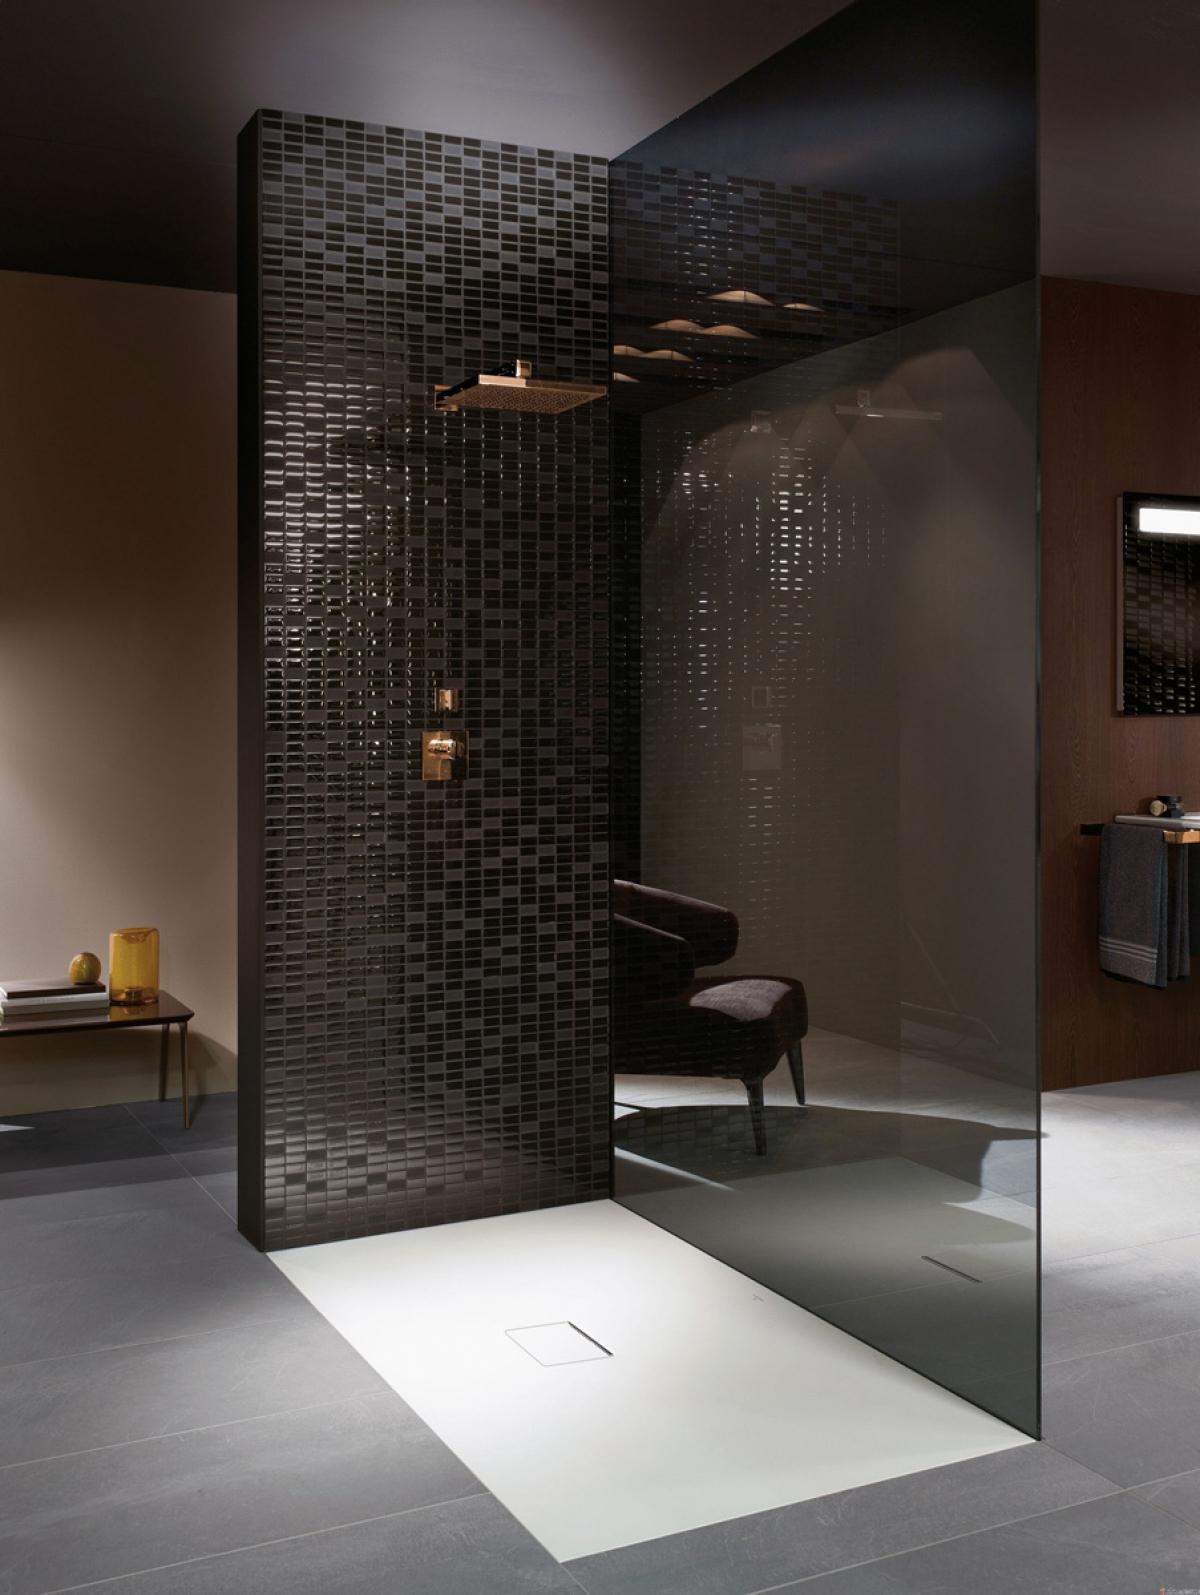 Receveur de douche squaro infinity villeroy boch for Villeroy et boch salle de bain showroom